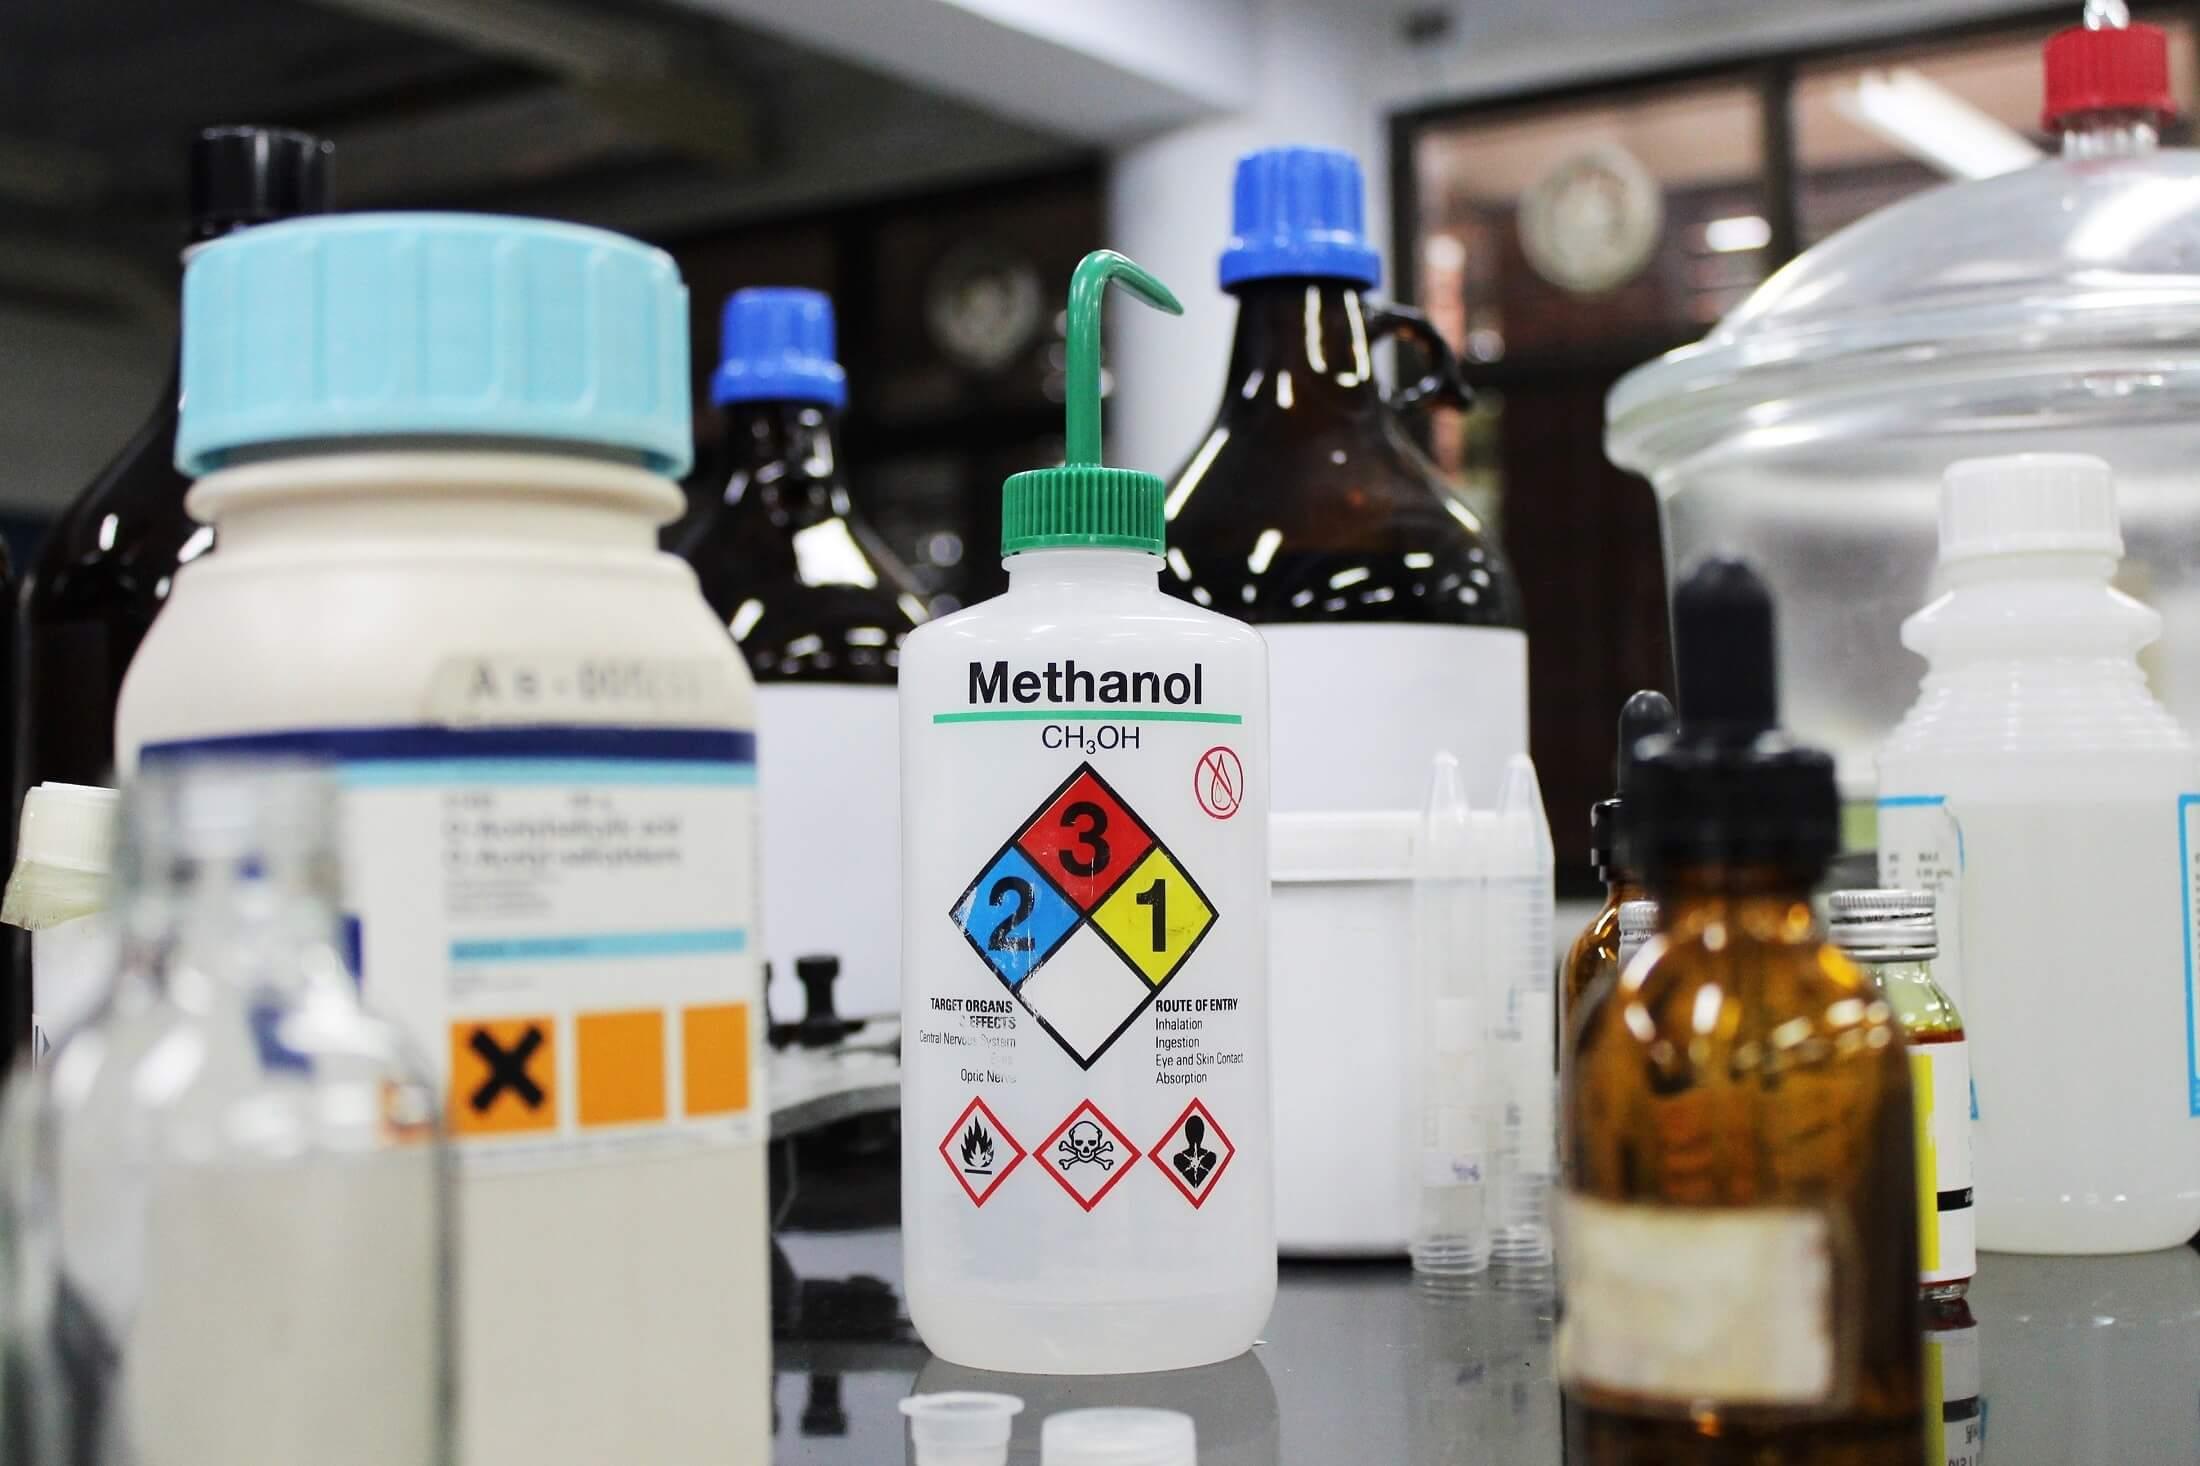 How to segregate incompatible hazardous chemicals